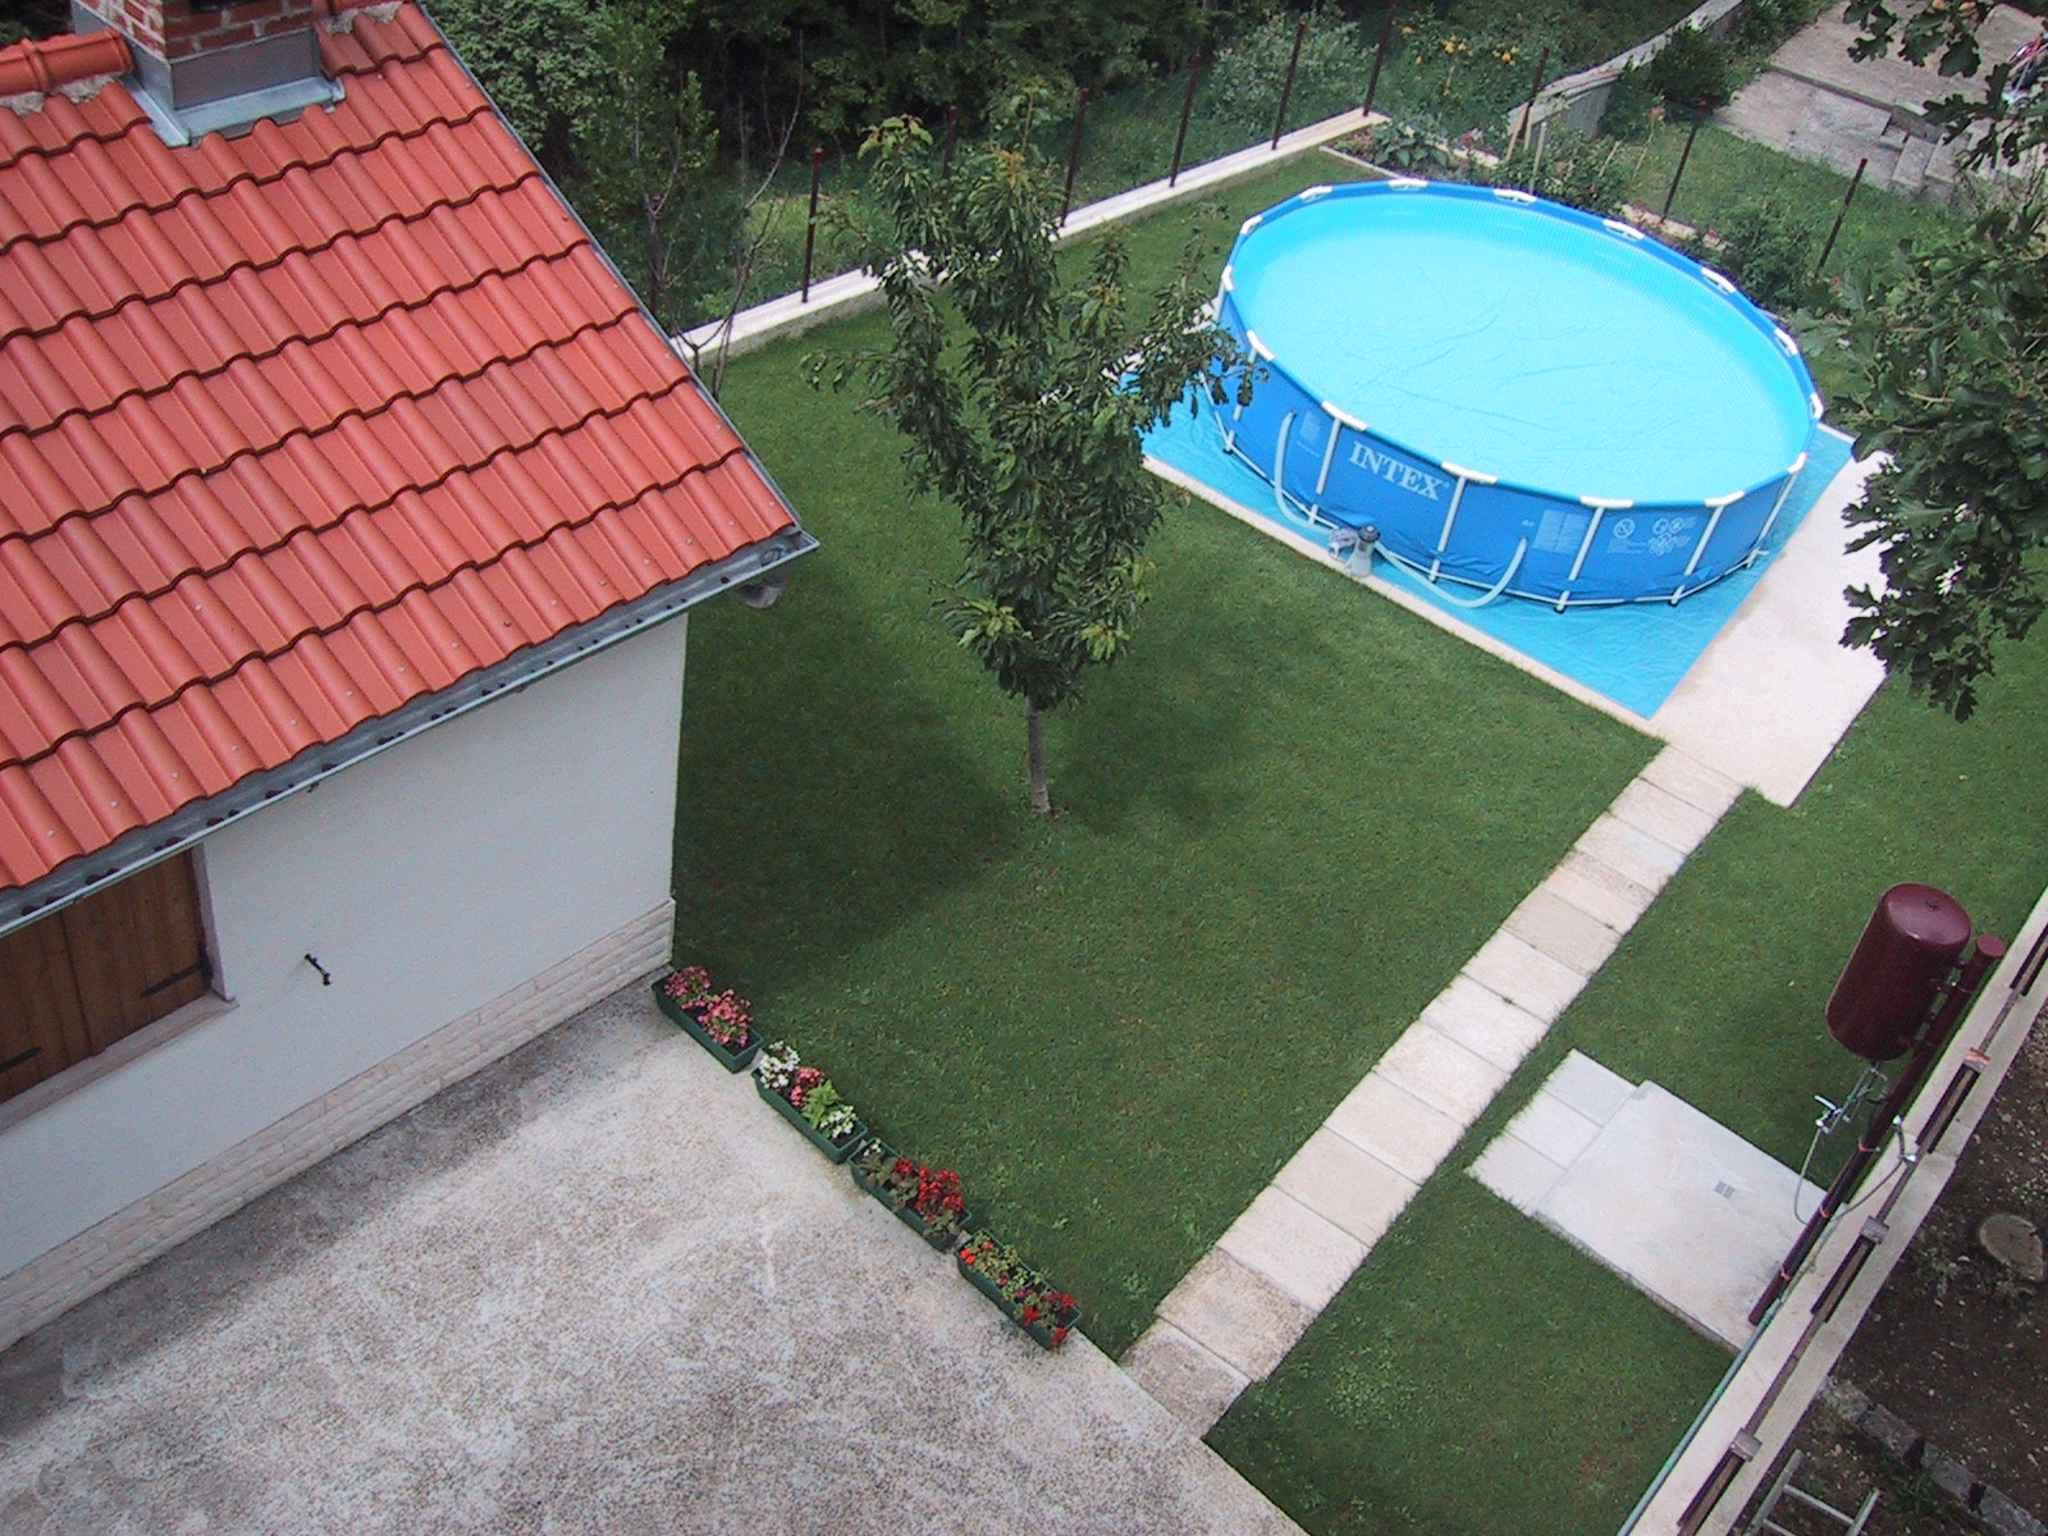 Appartement de vacances s ljetnom kuhinjom i bazenom (648047), Grižane, , Kvarner, Croatie, image 3